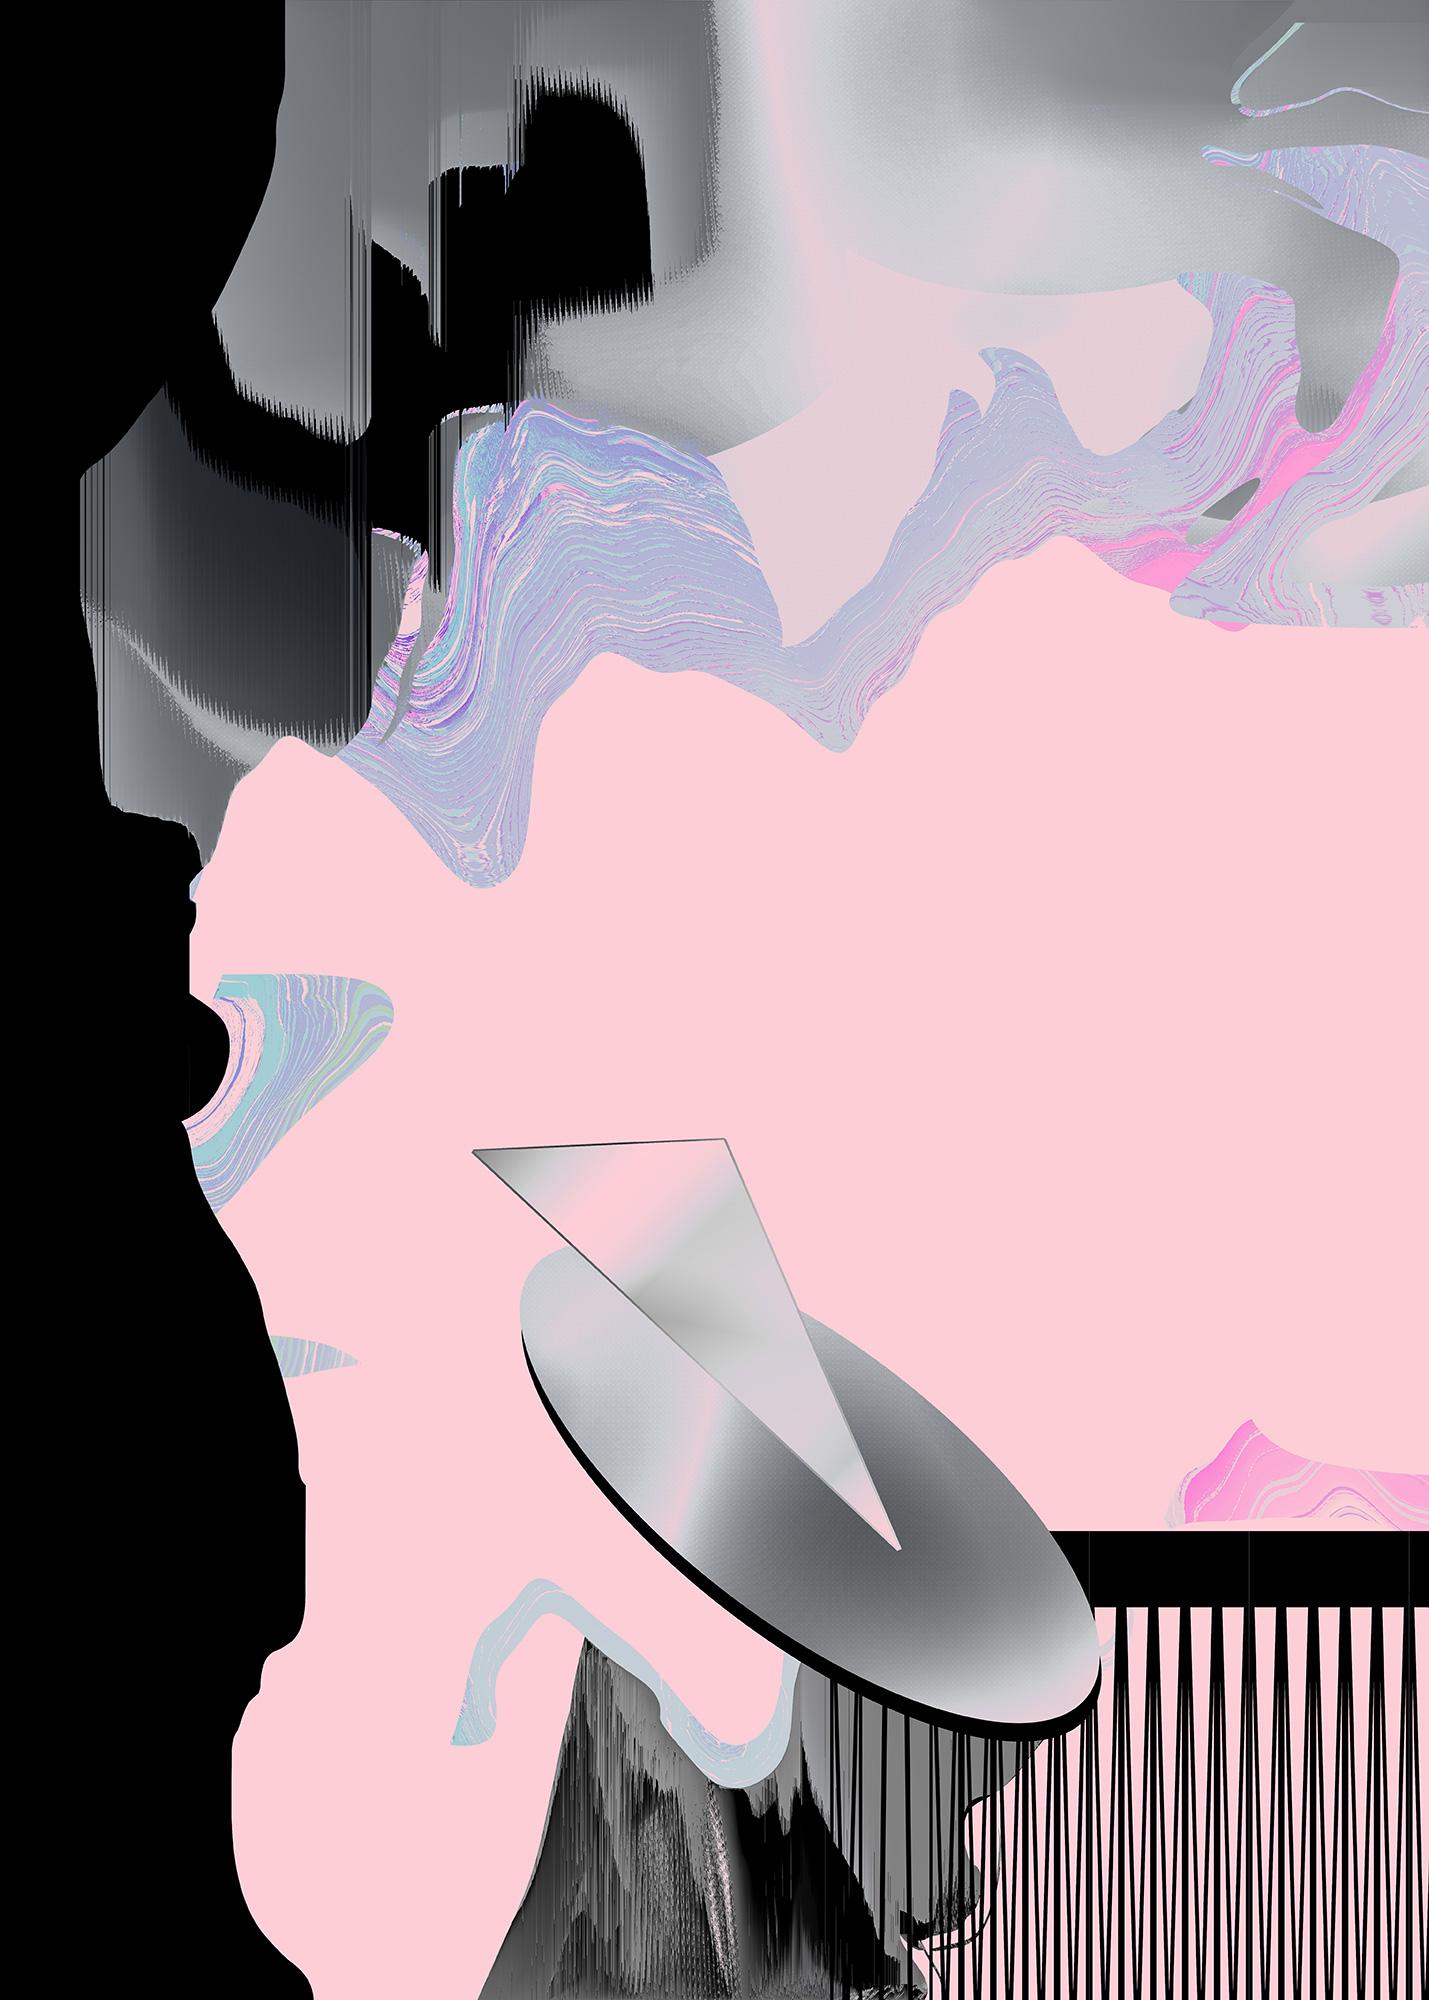 Ewa Doroszenko – Composition with the Sun online 03, obraz